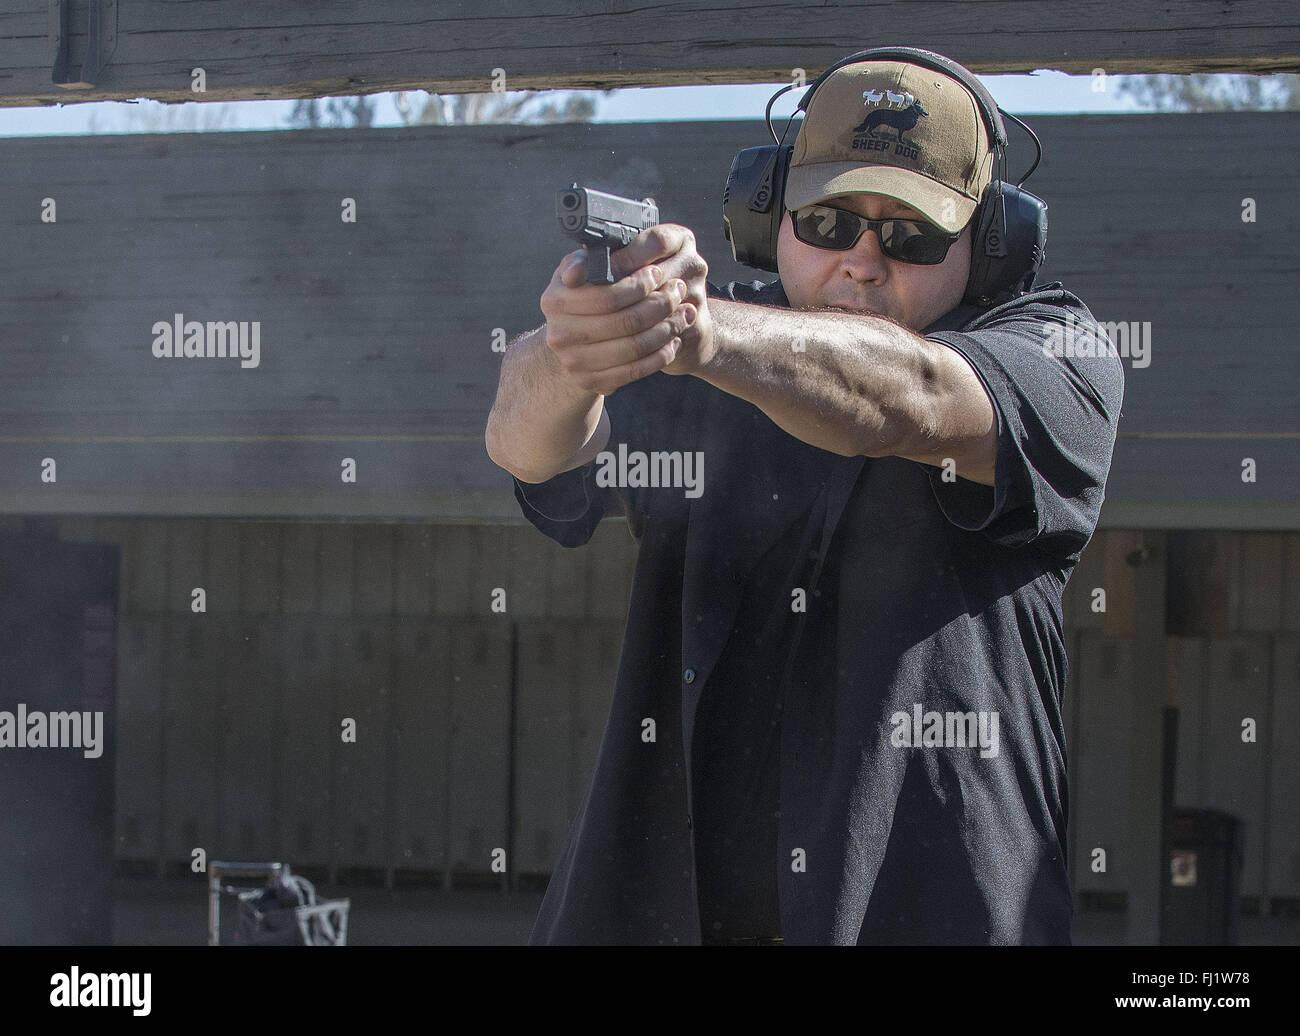 Chino, California, USA. 27th Feb, 2016. Steven Pappas of La Palma, Ca. keeps his shooting skills sharp. Pappas, - Stock Image